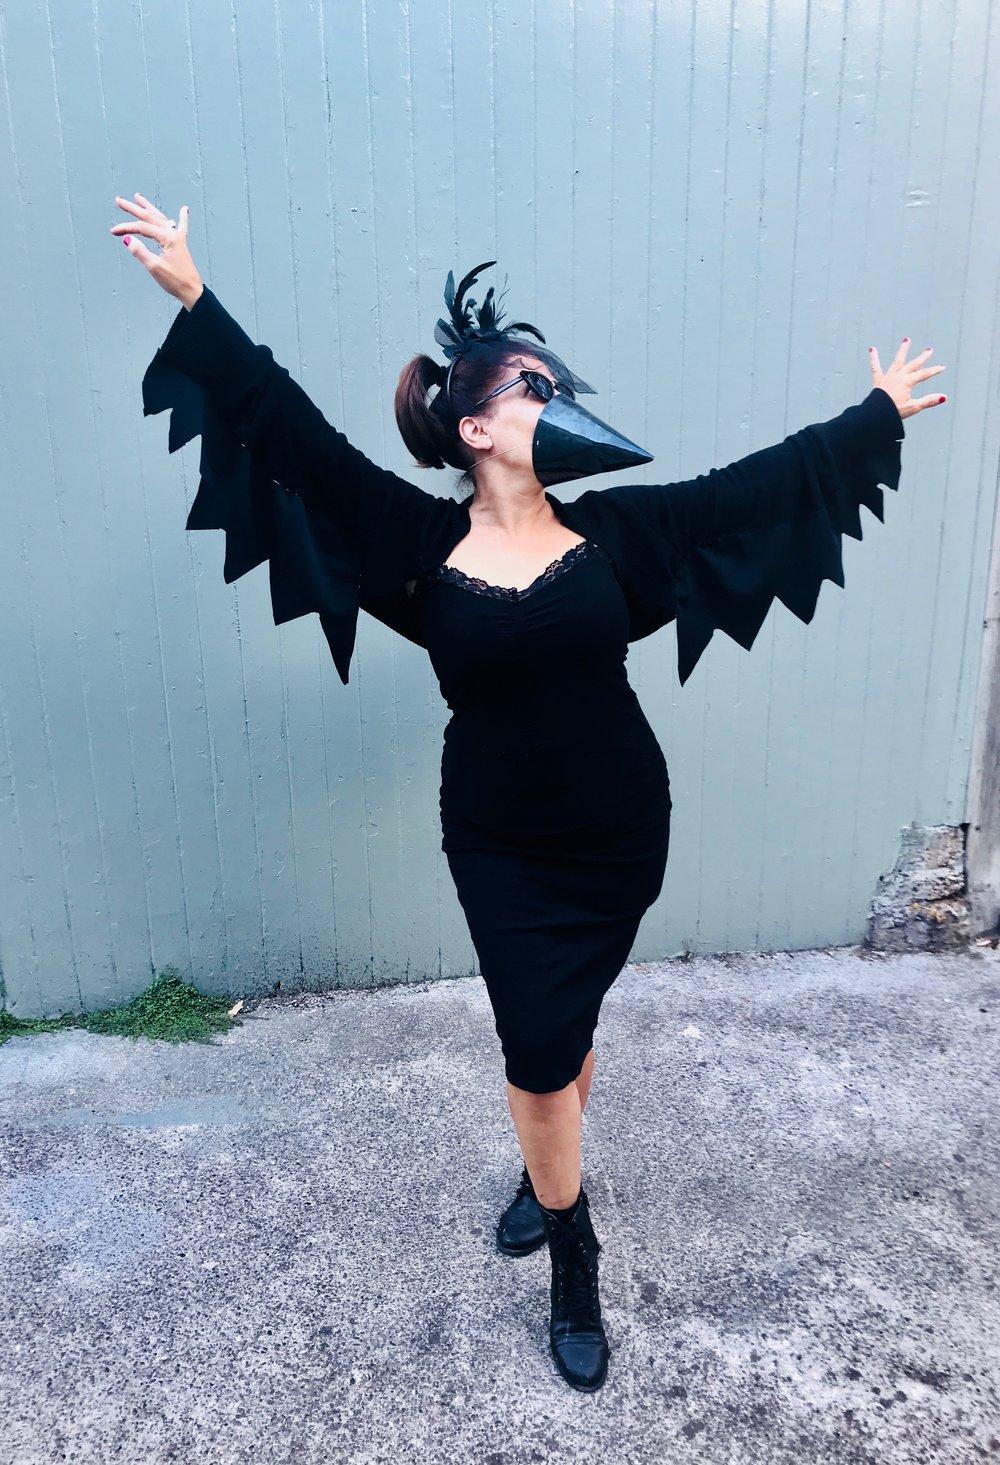 Day 278. Blackbird